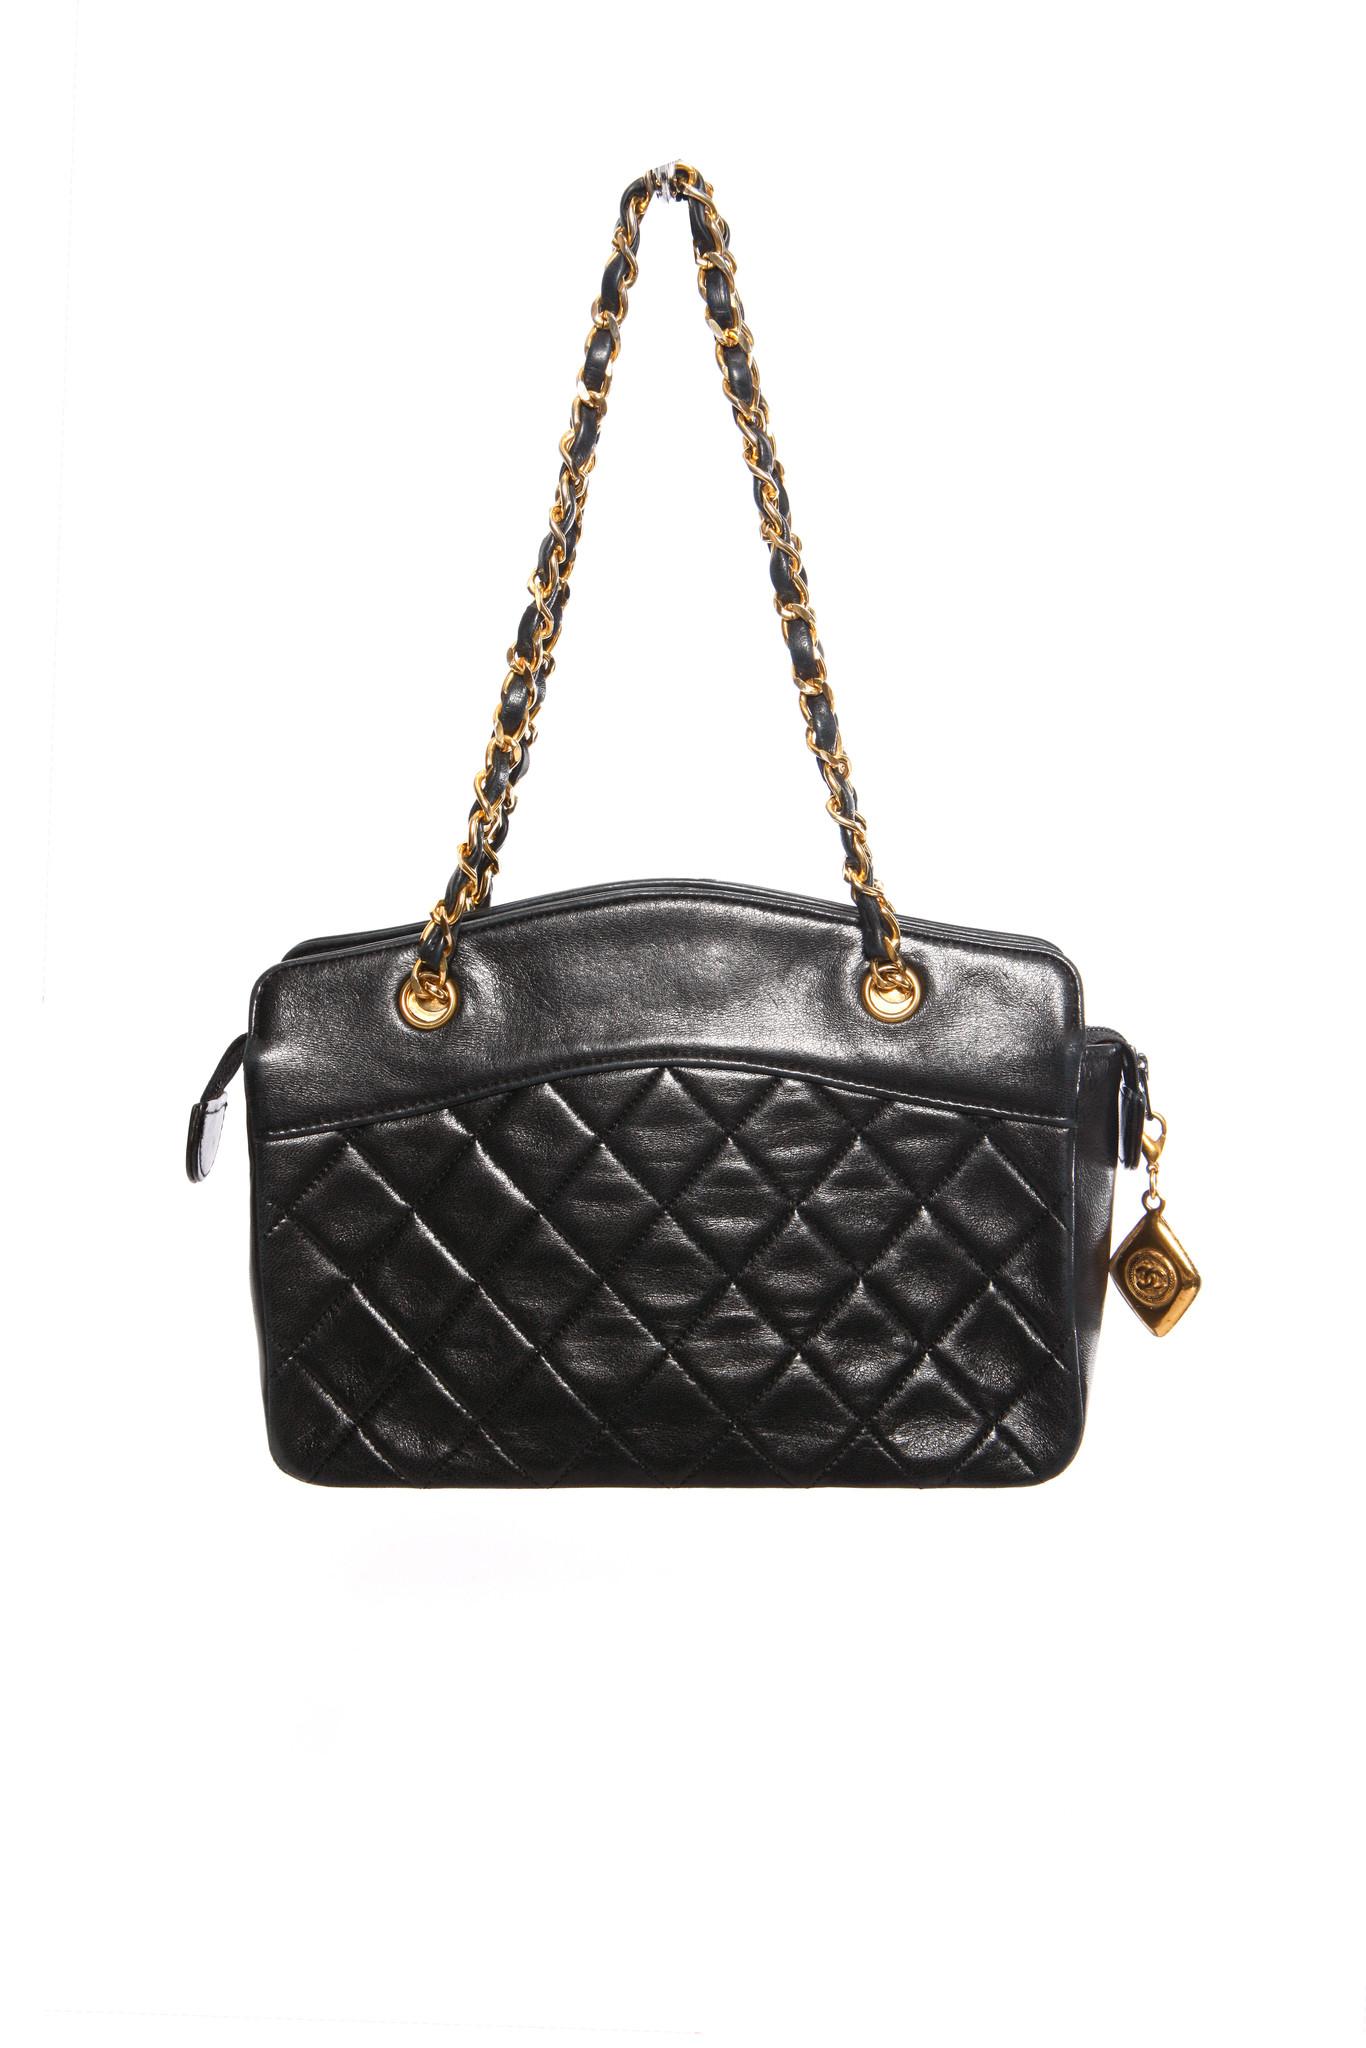 Verbazingwekkend Chanel, Vintage mini-zwarte lamsleren gewatteerde handtas met FG-58